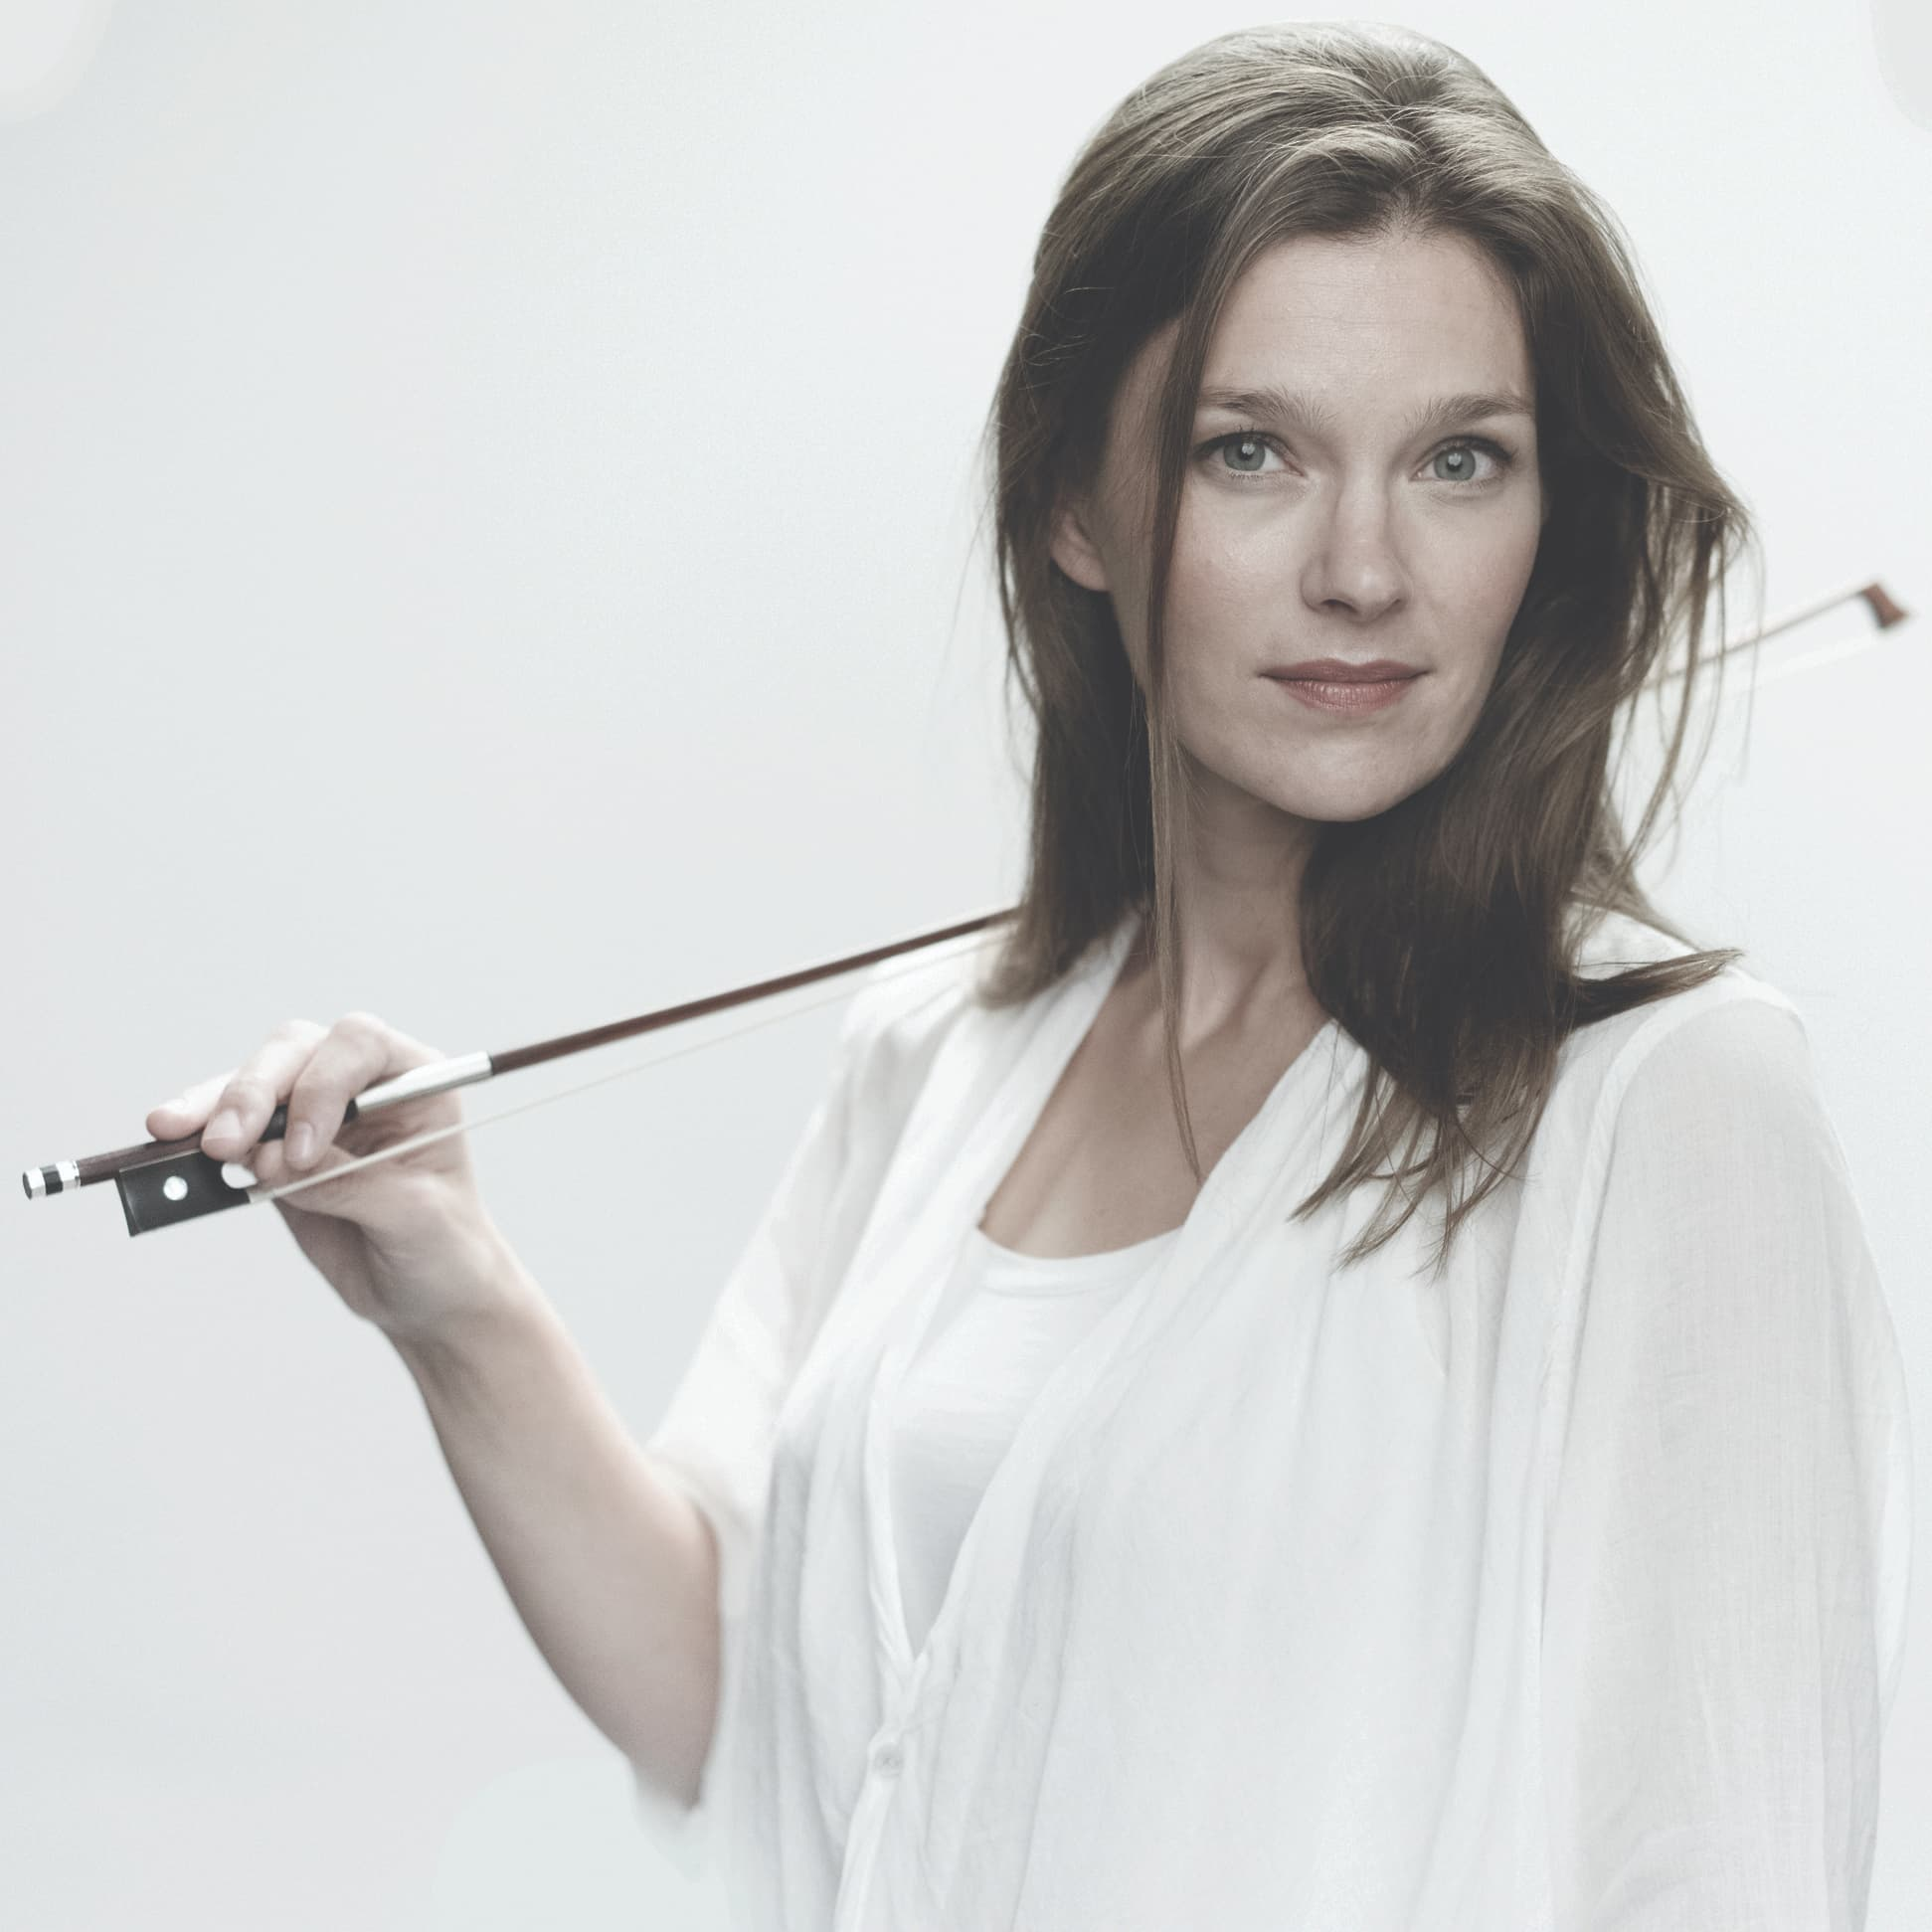 Violinista holandesa Janine Jansen se apresenta pela primeira vez no Brasil